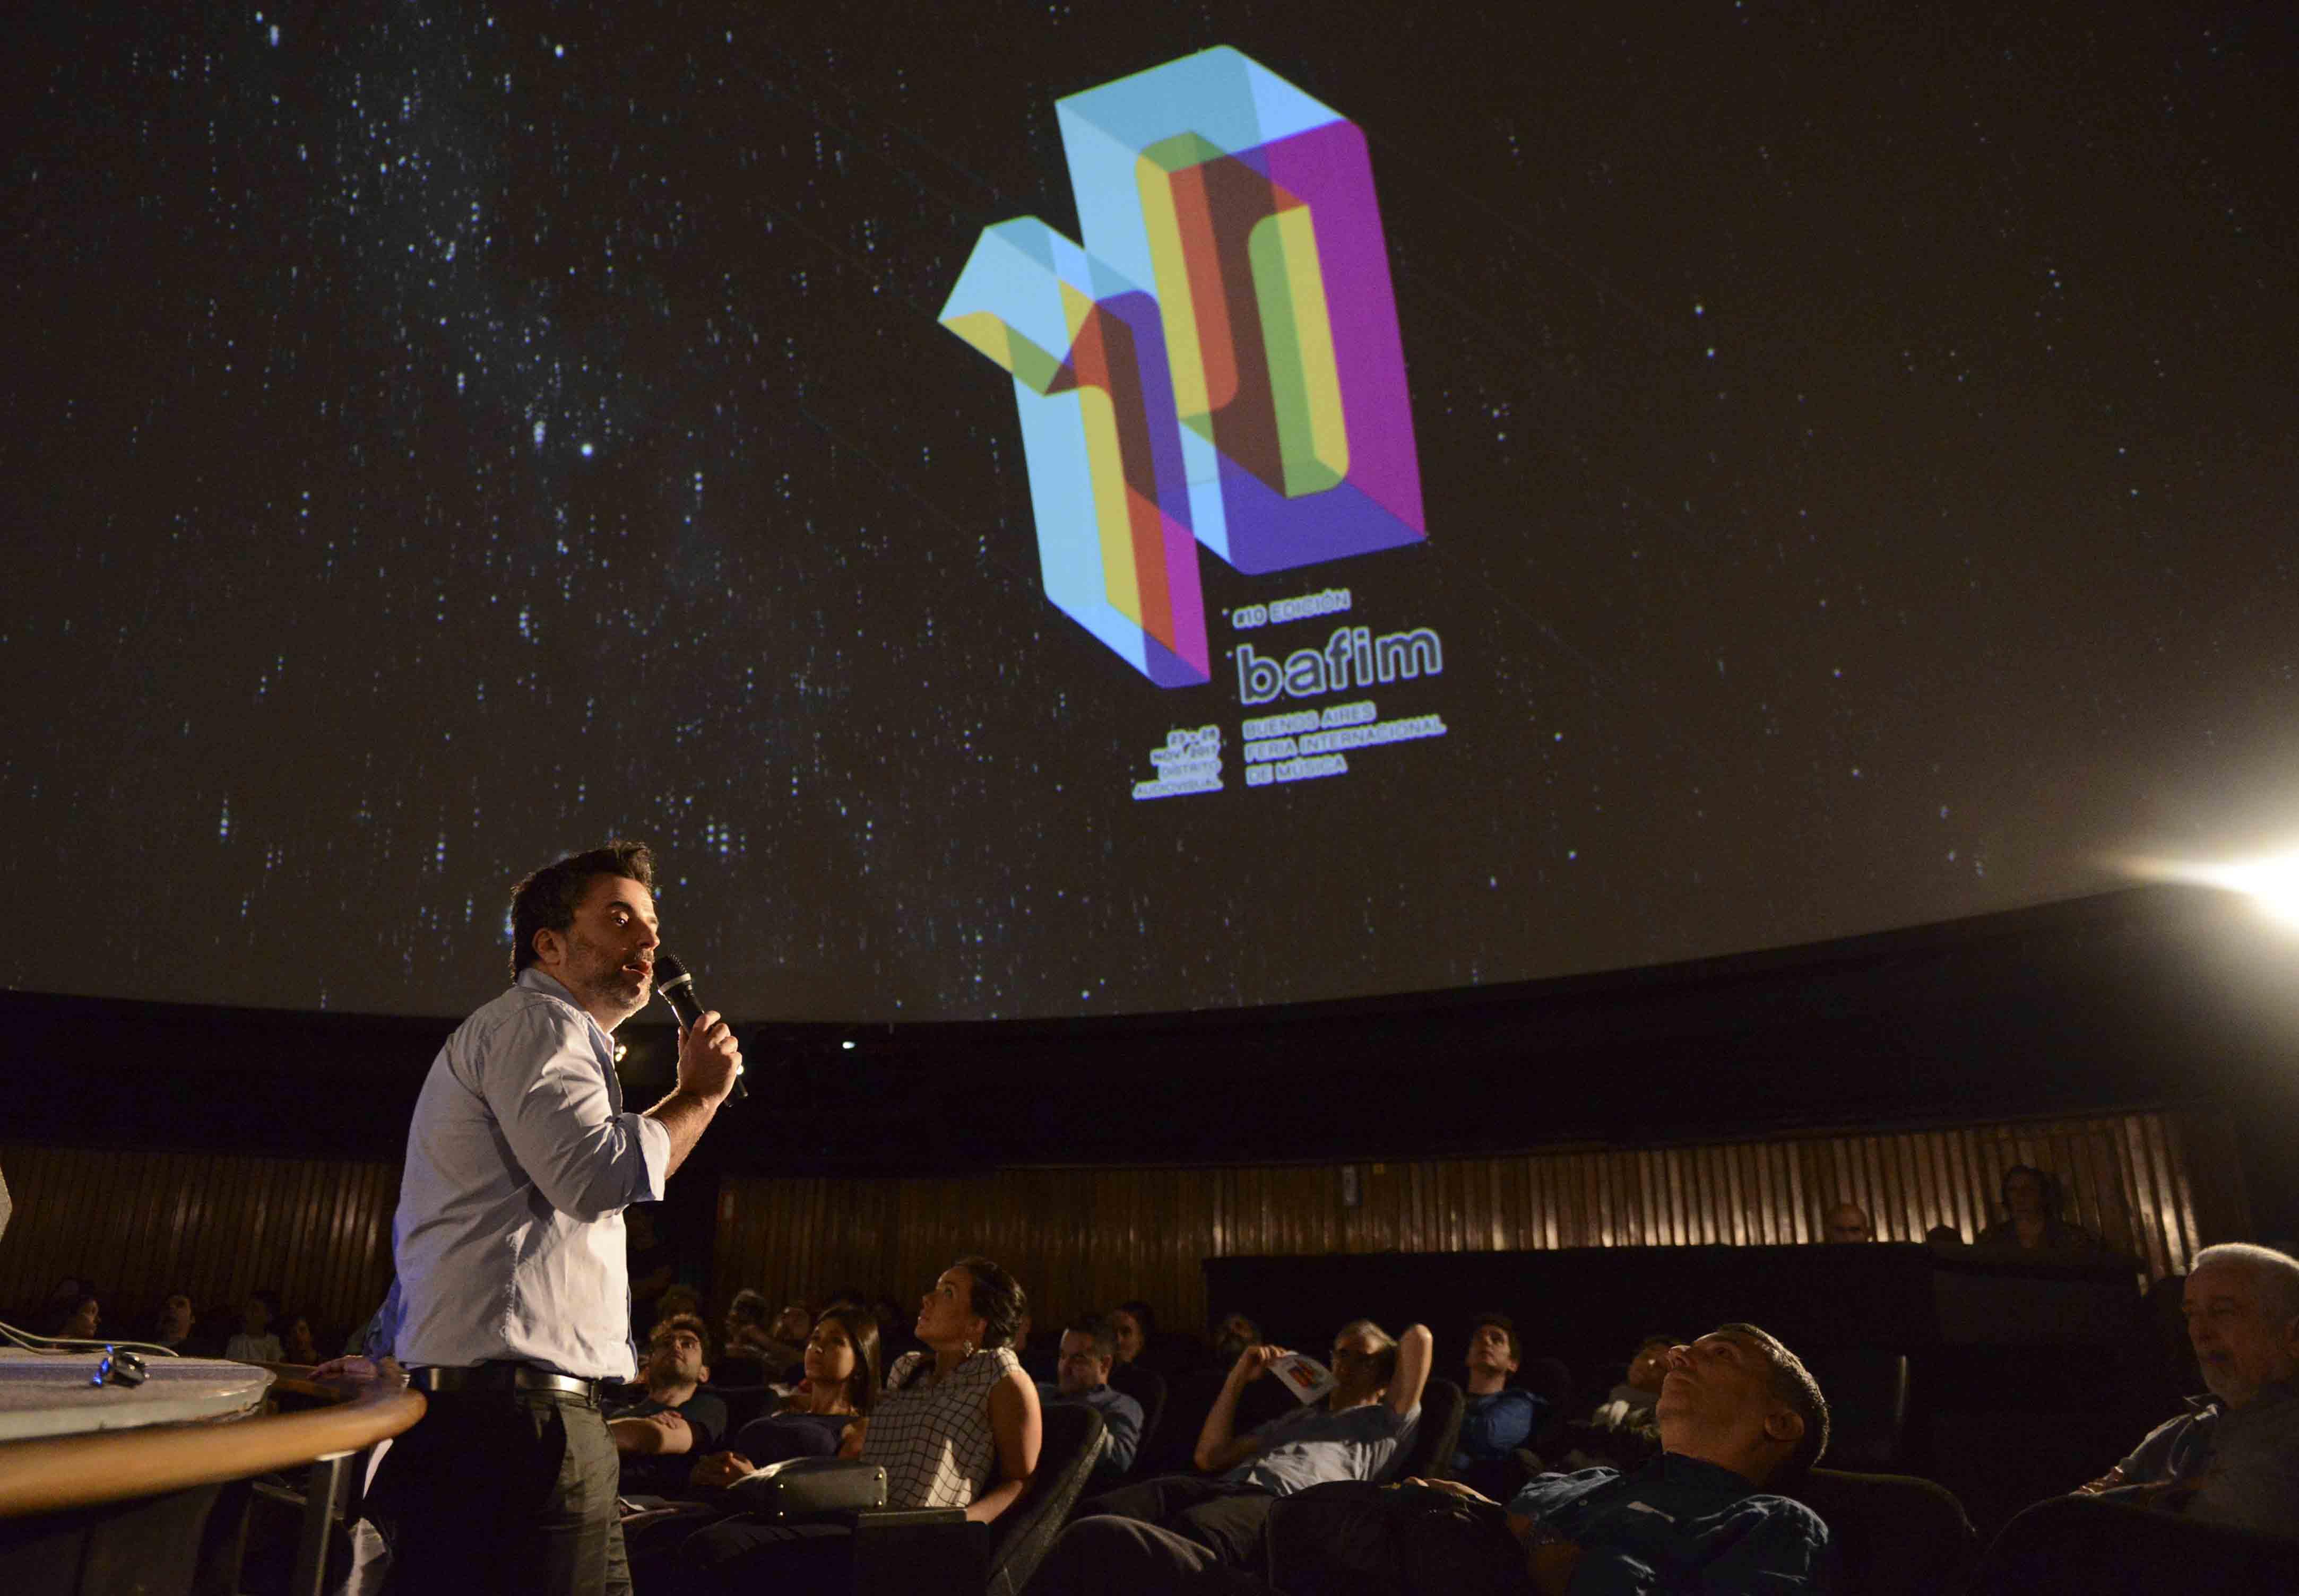 23-11-17 Bafim - 10 años - Planetario